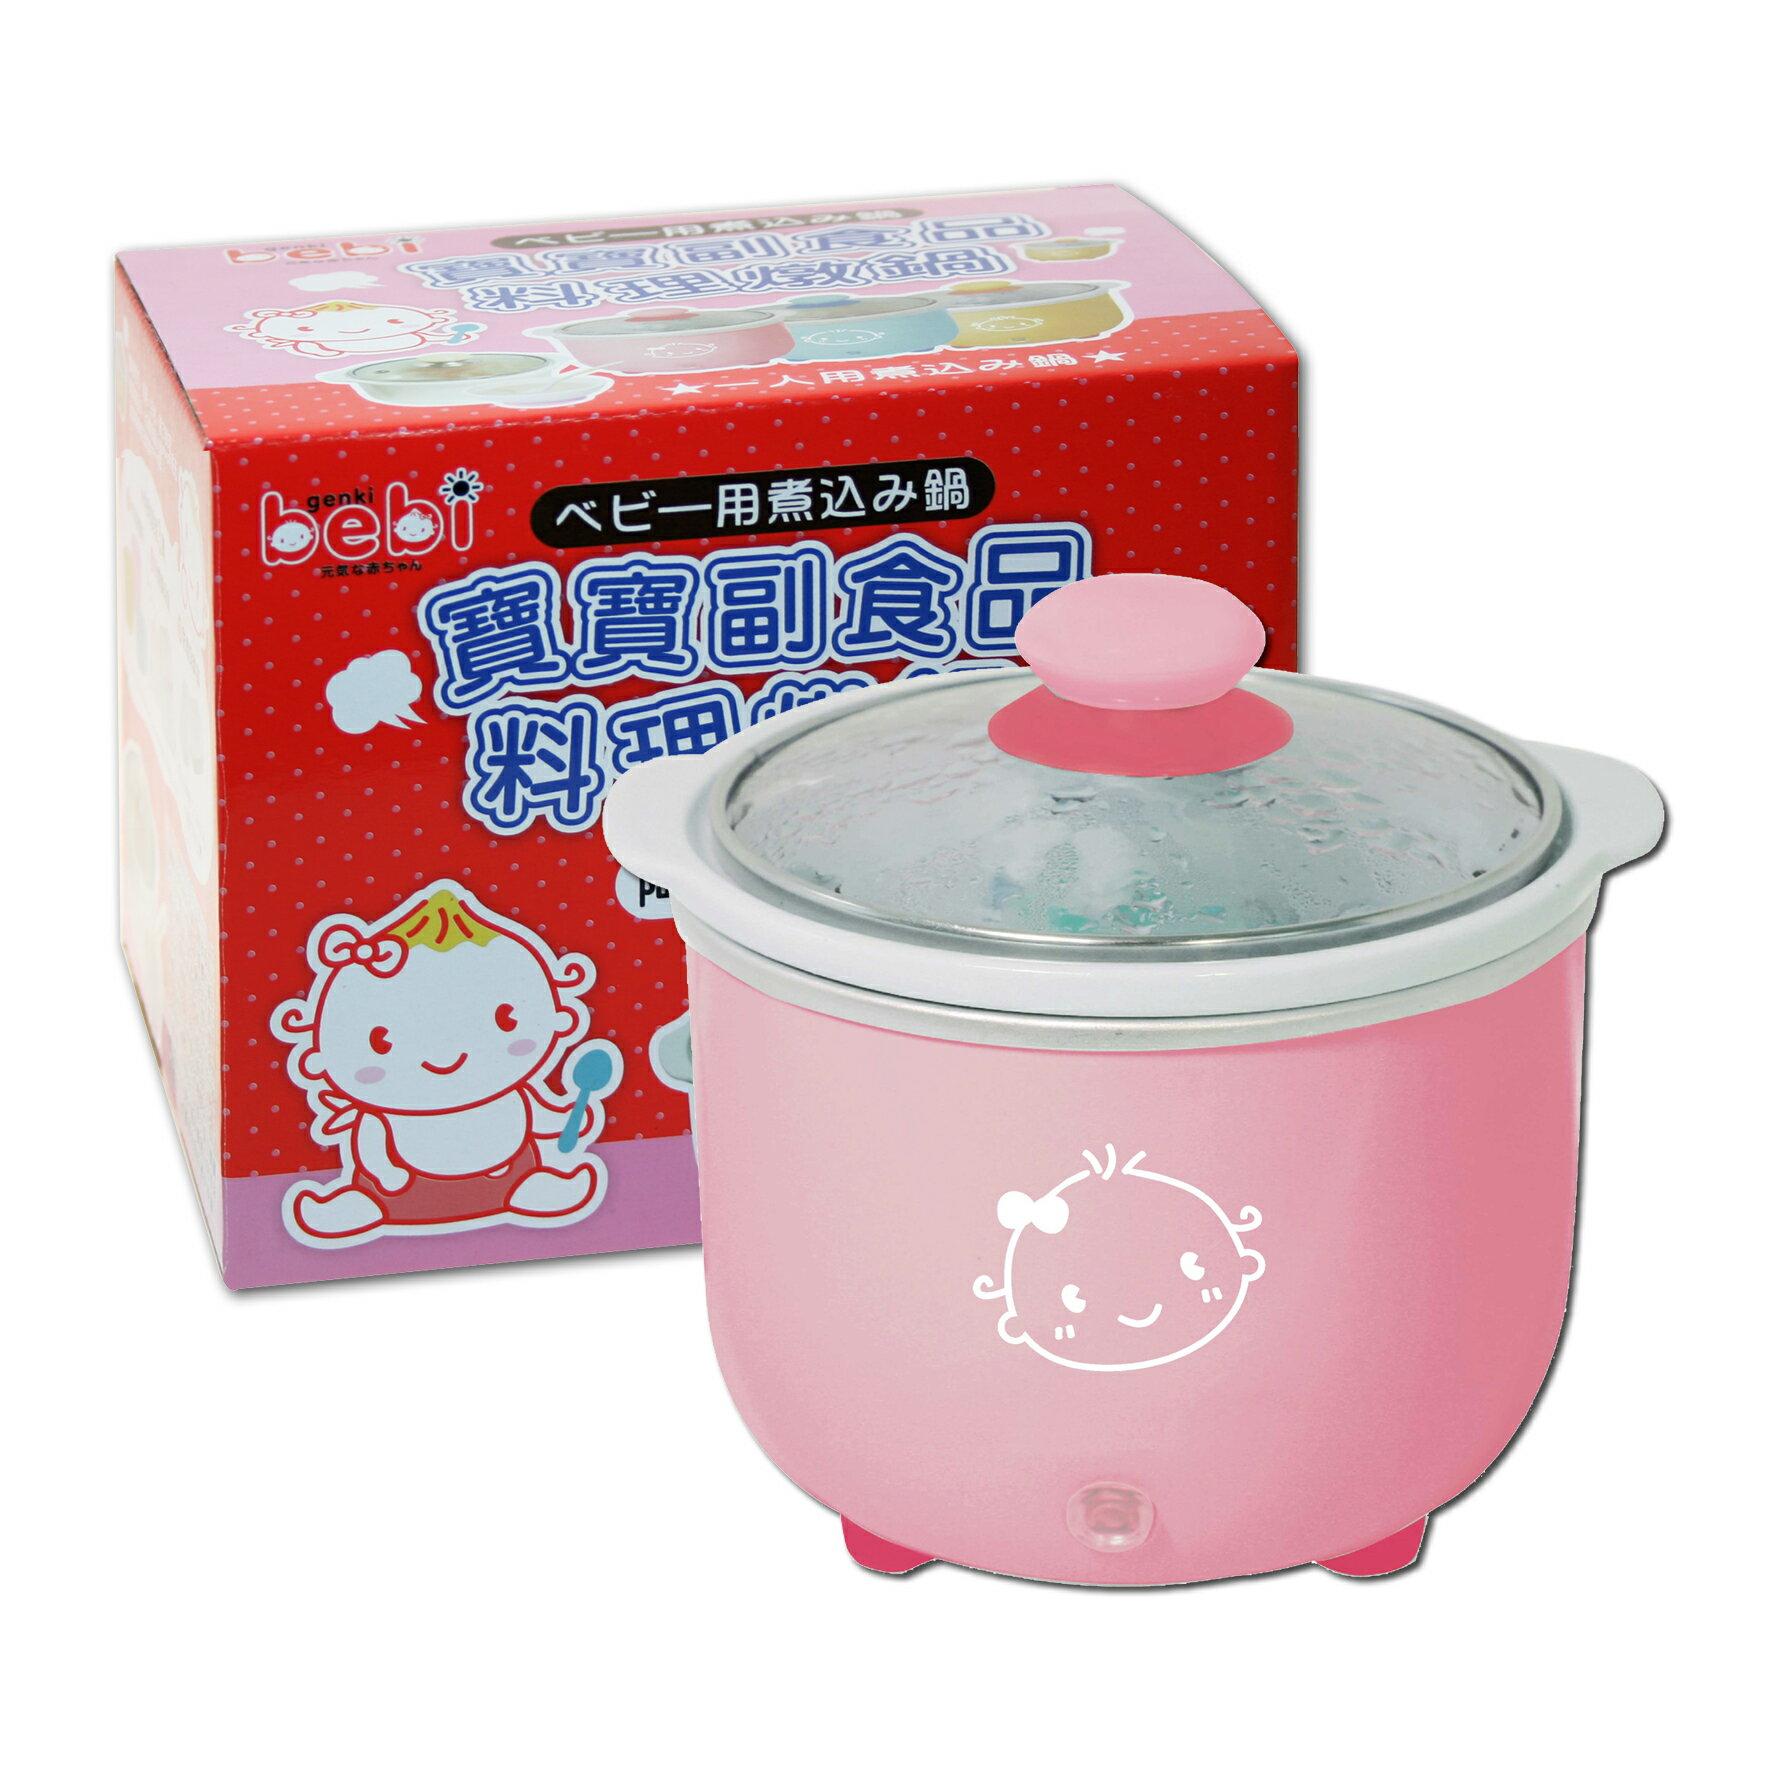 genki bebi 元氣寶寶 寶寶副食品料理燉鍋 粉色